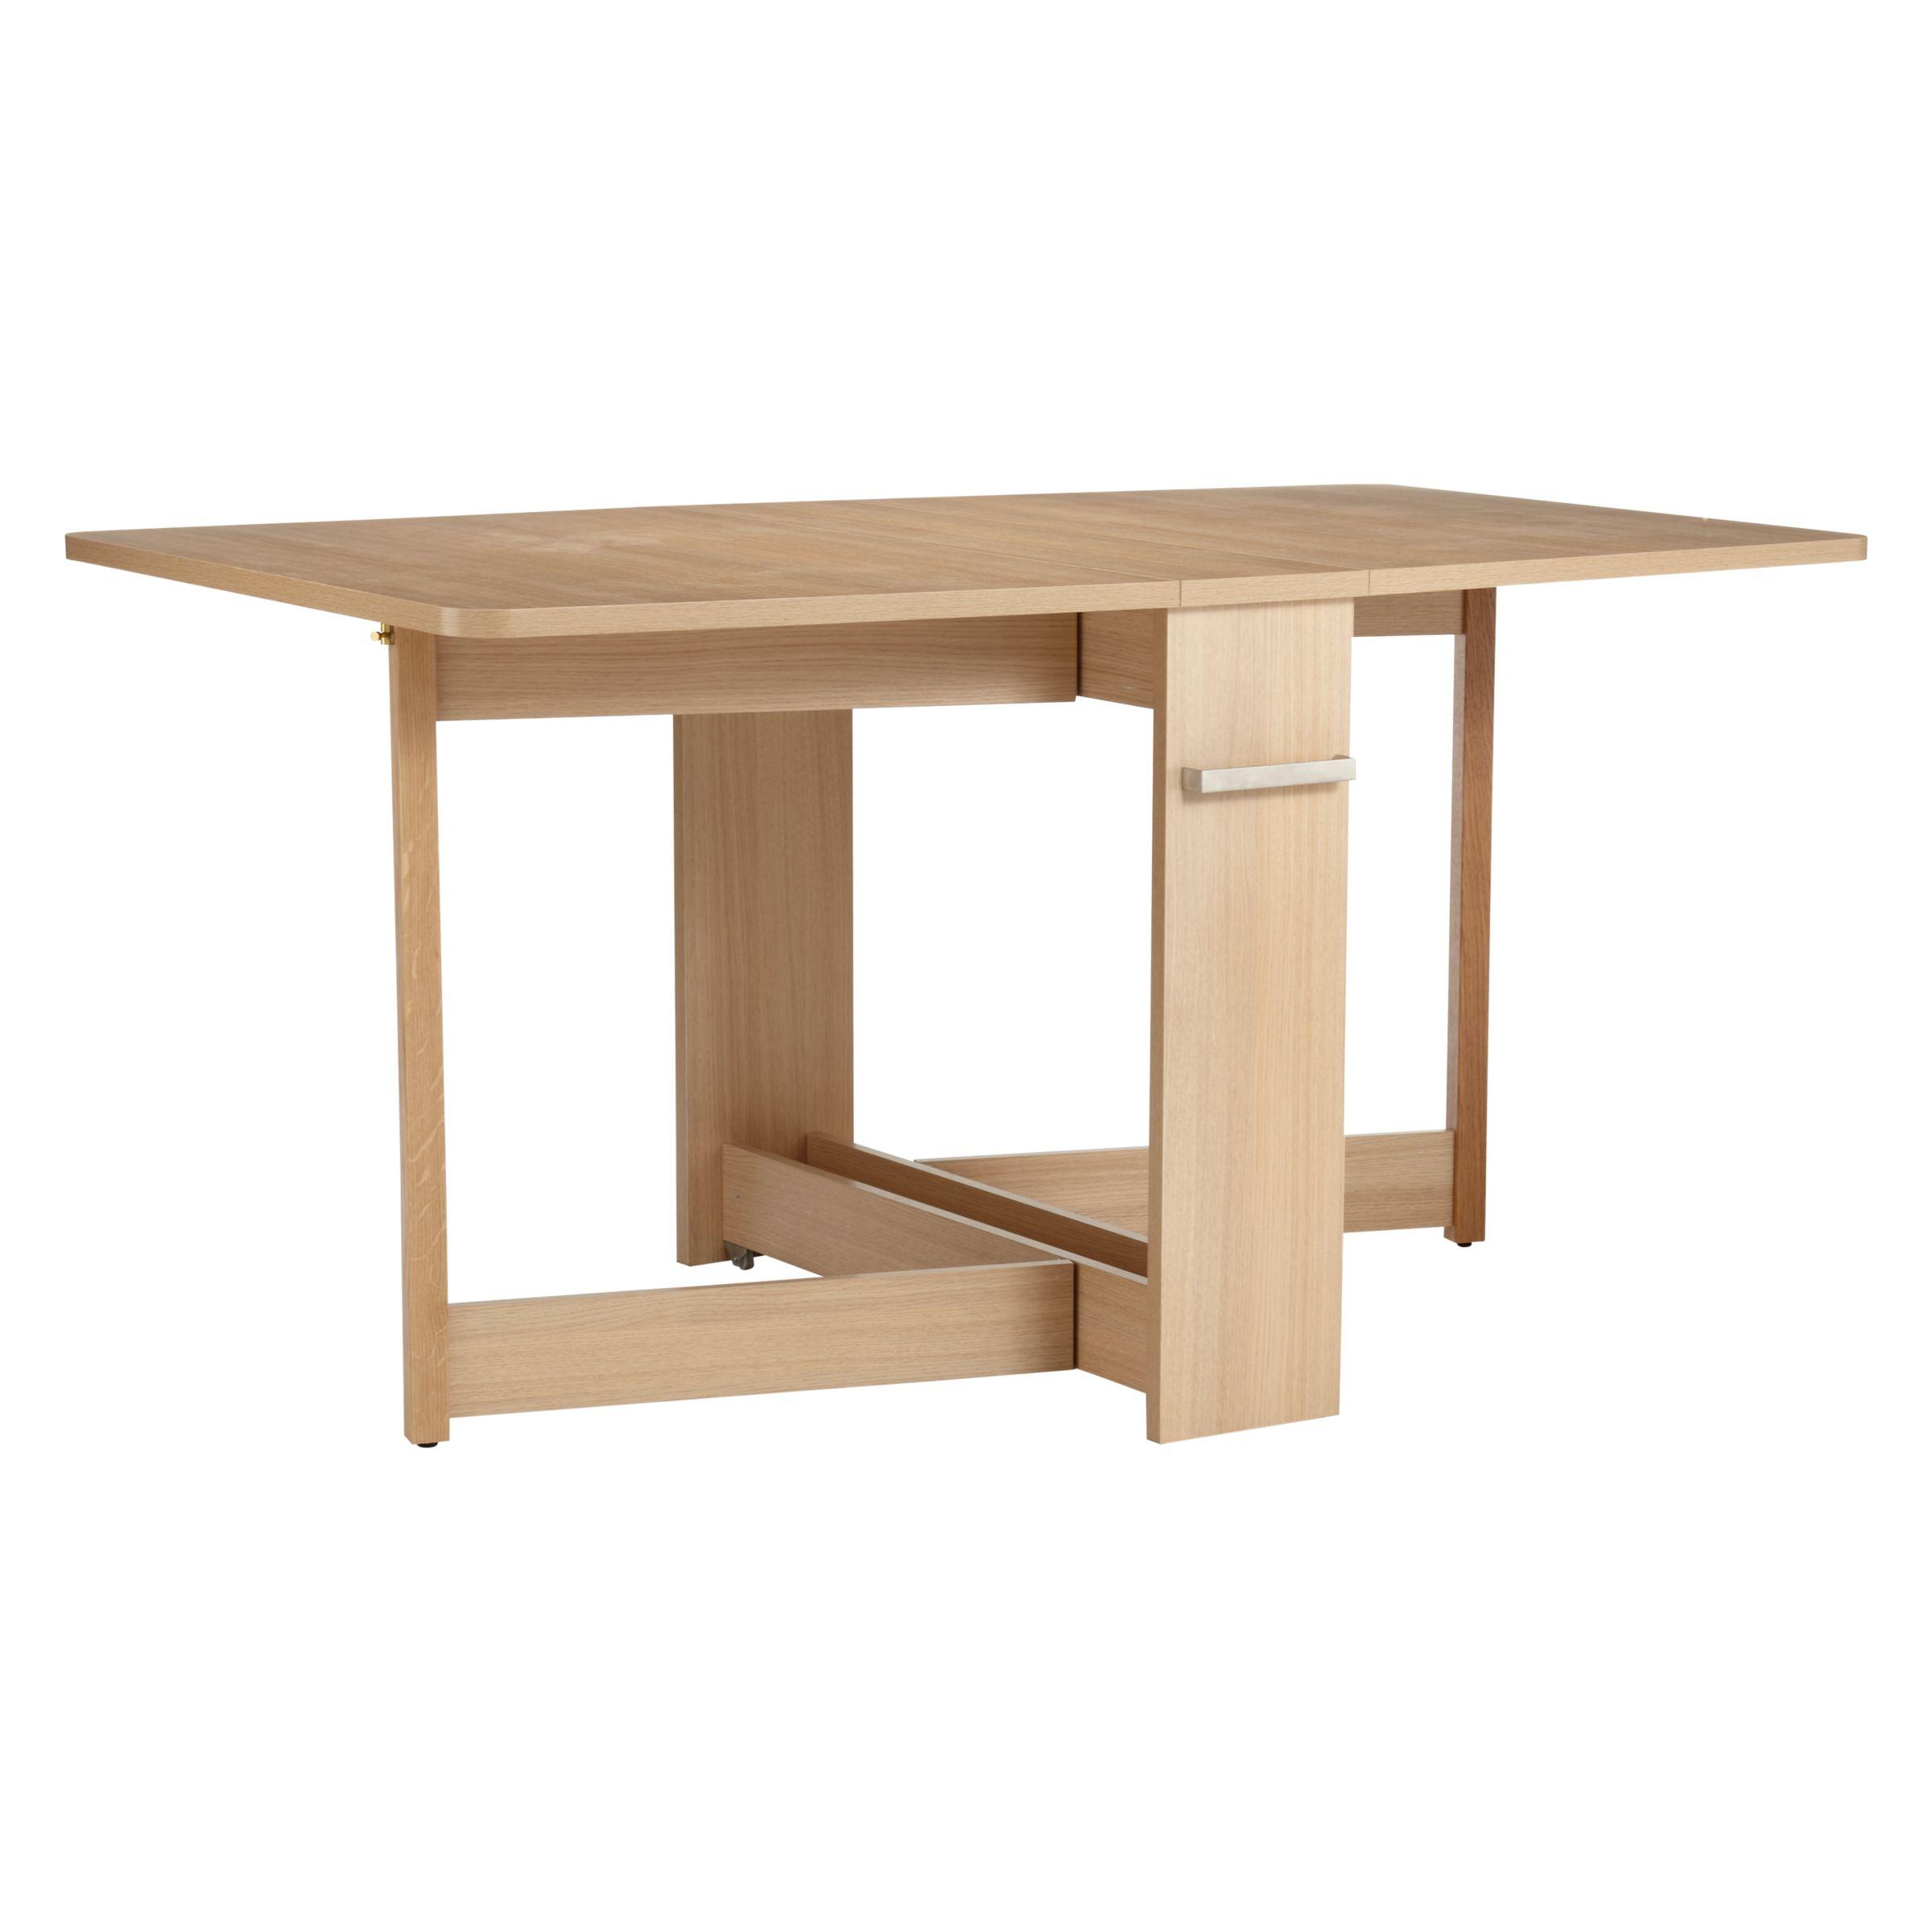 Leonhard Pfeifer for John Lewis Leonhard Pfeifer for John Lewis Croyde 6 Seater Drop Leaf Folding Dining Table